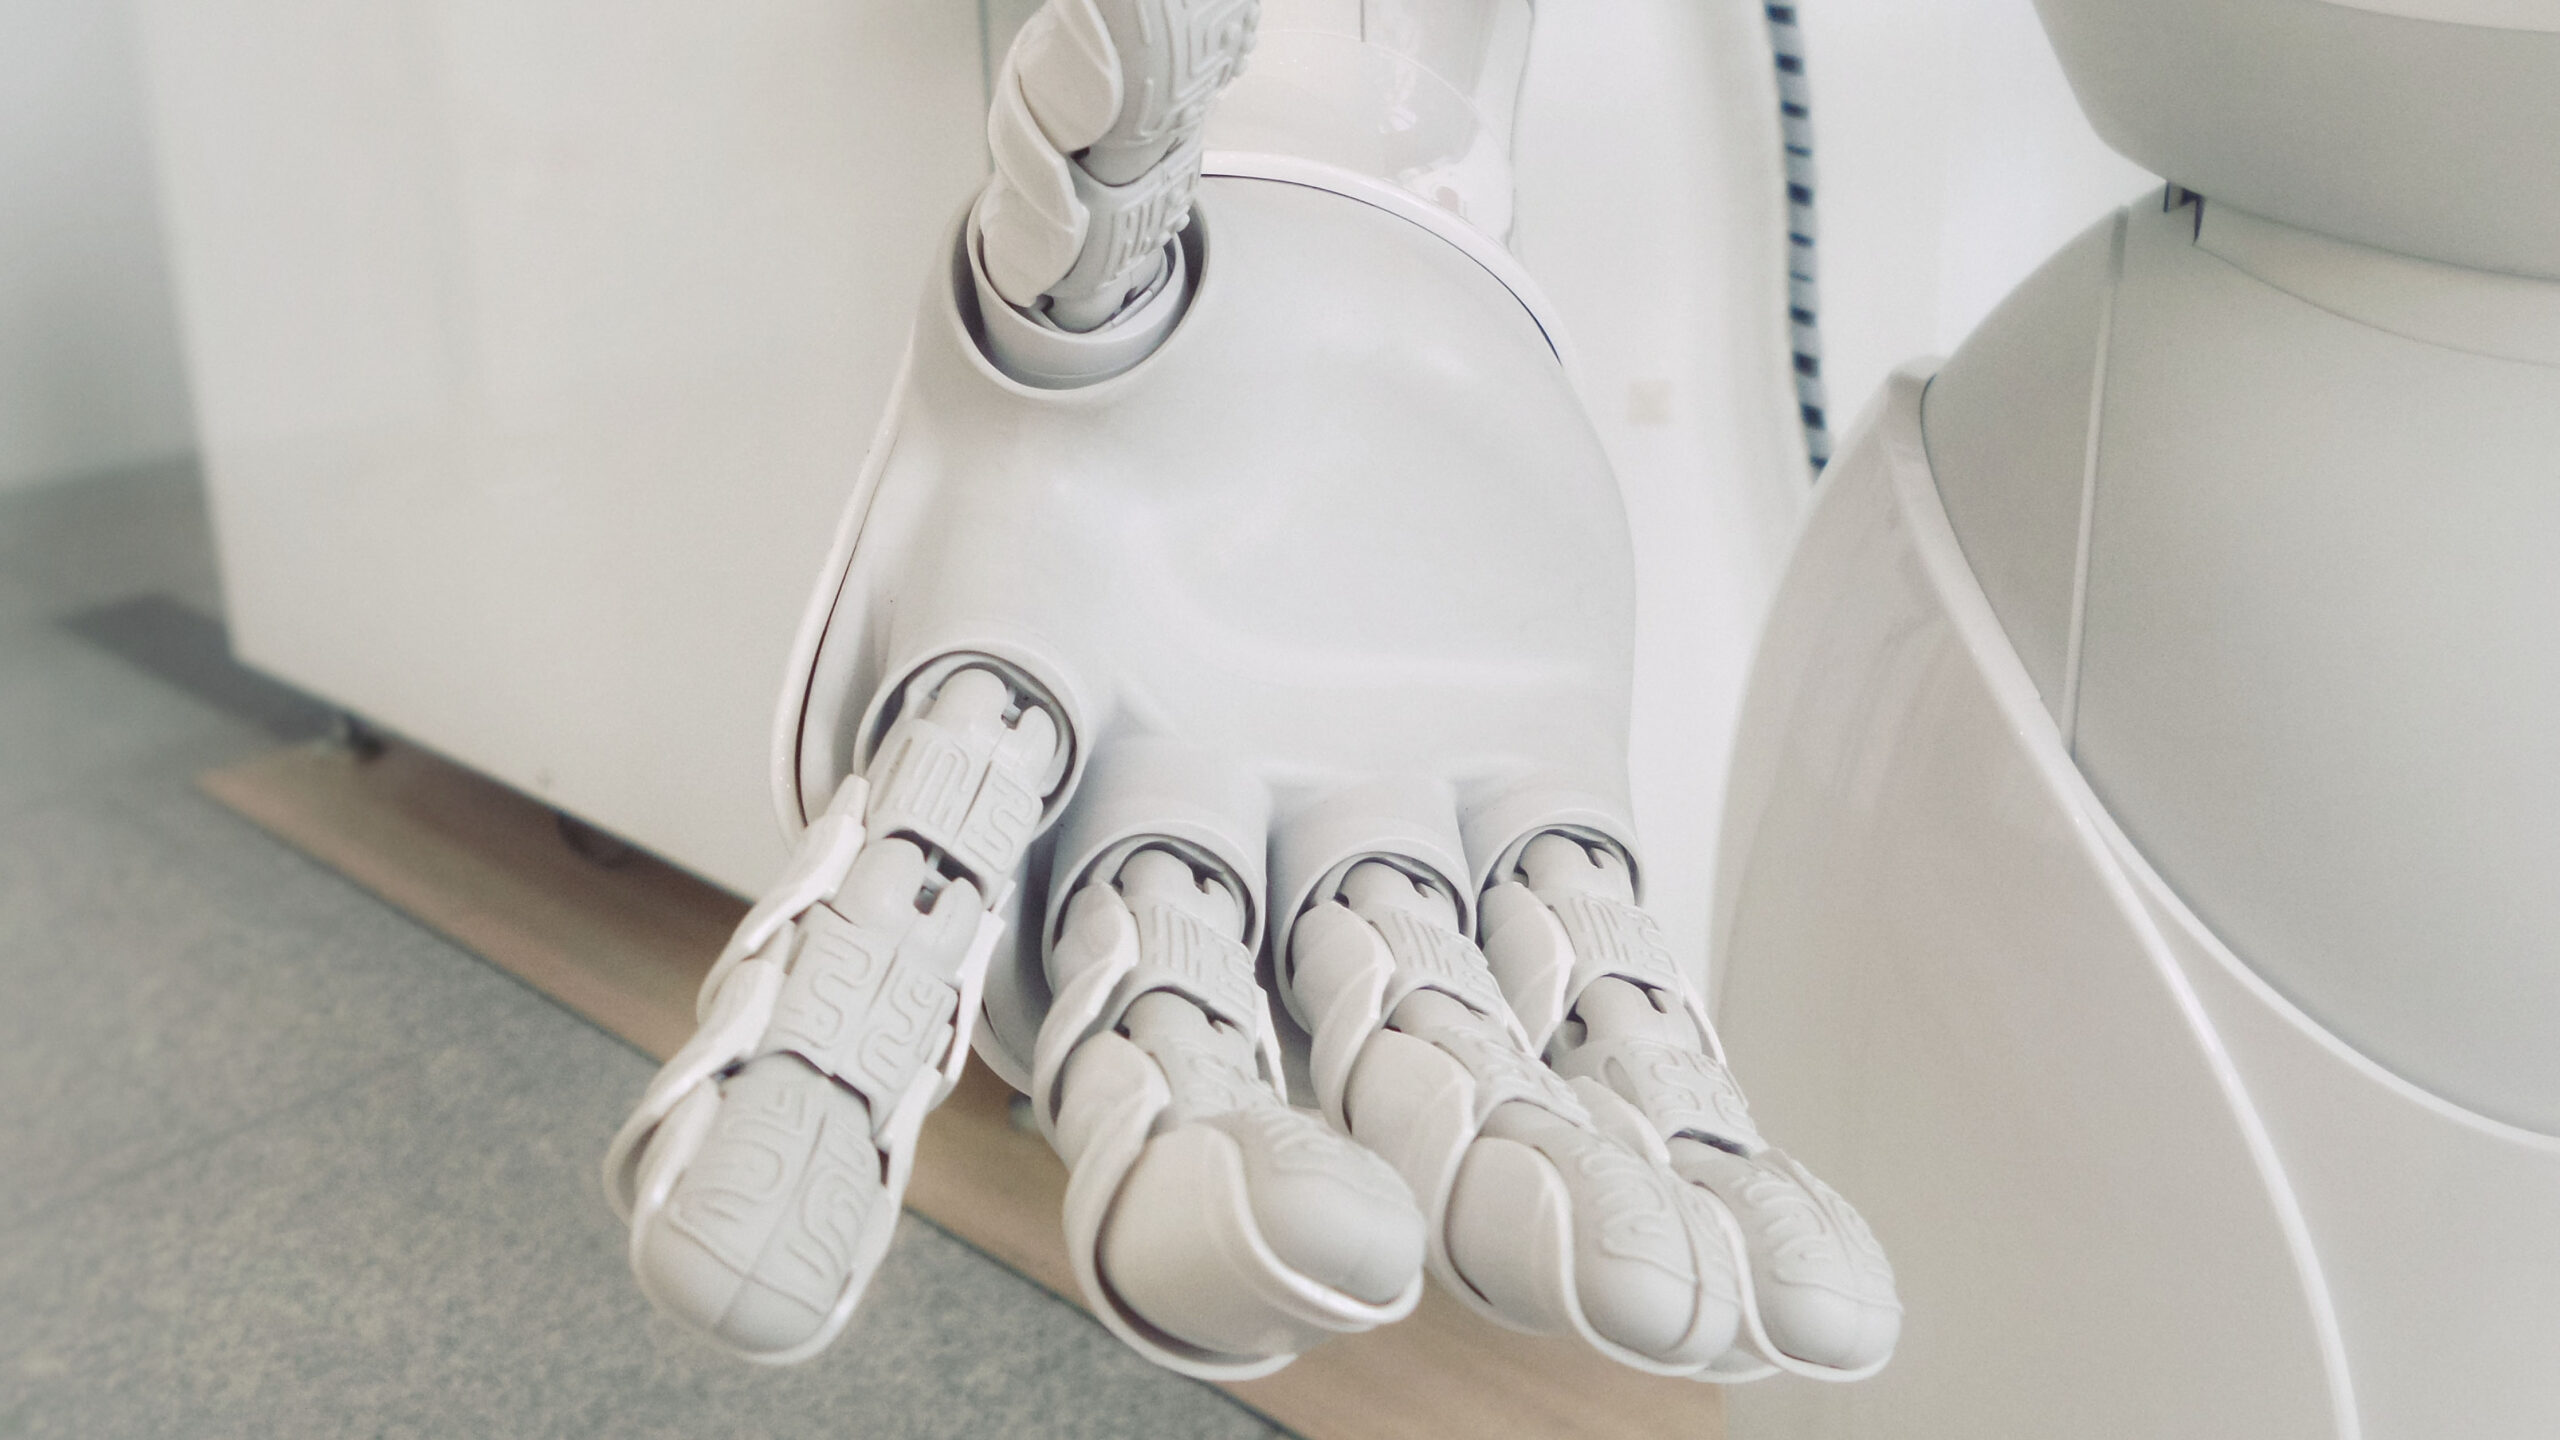 White robot hand.